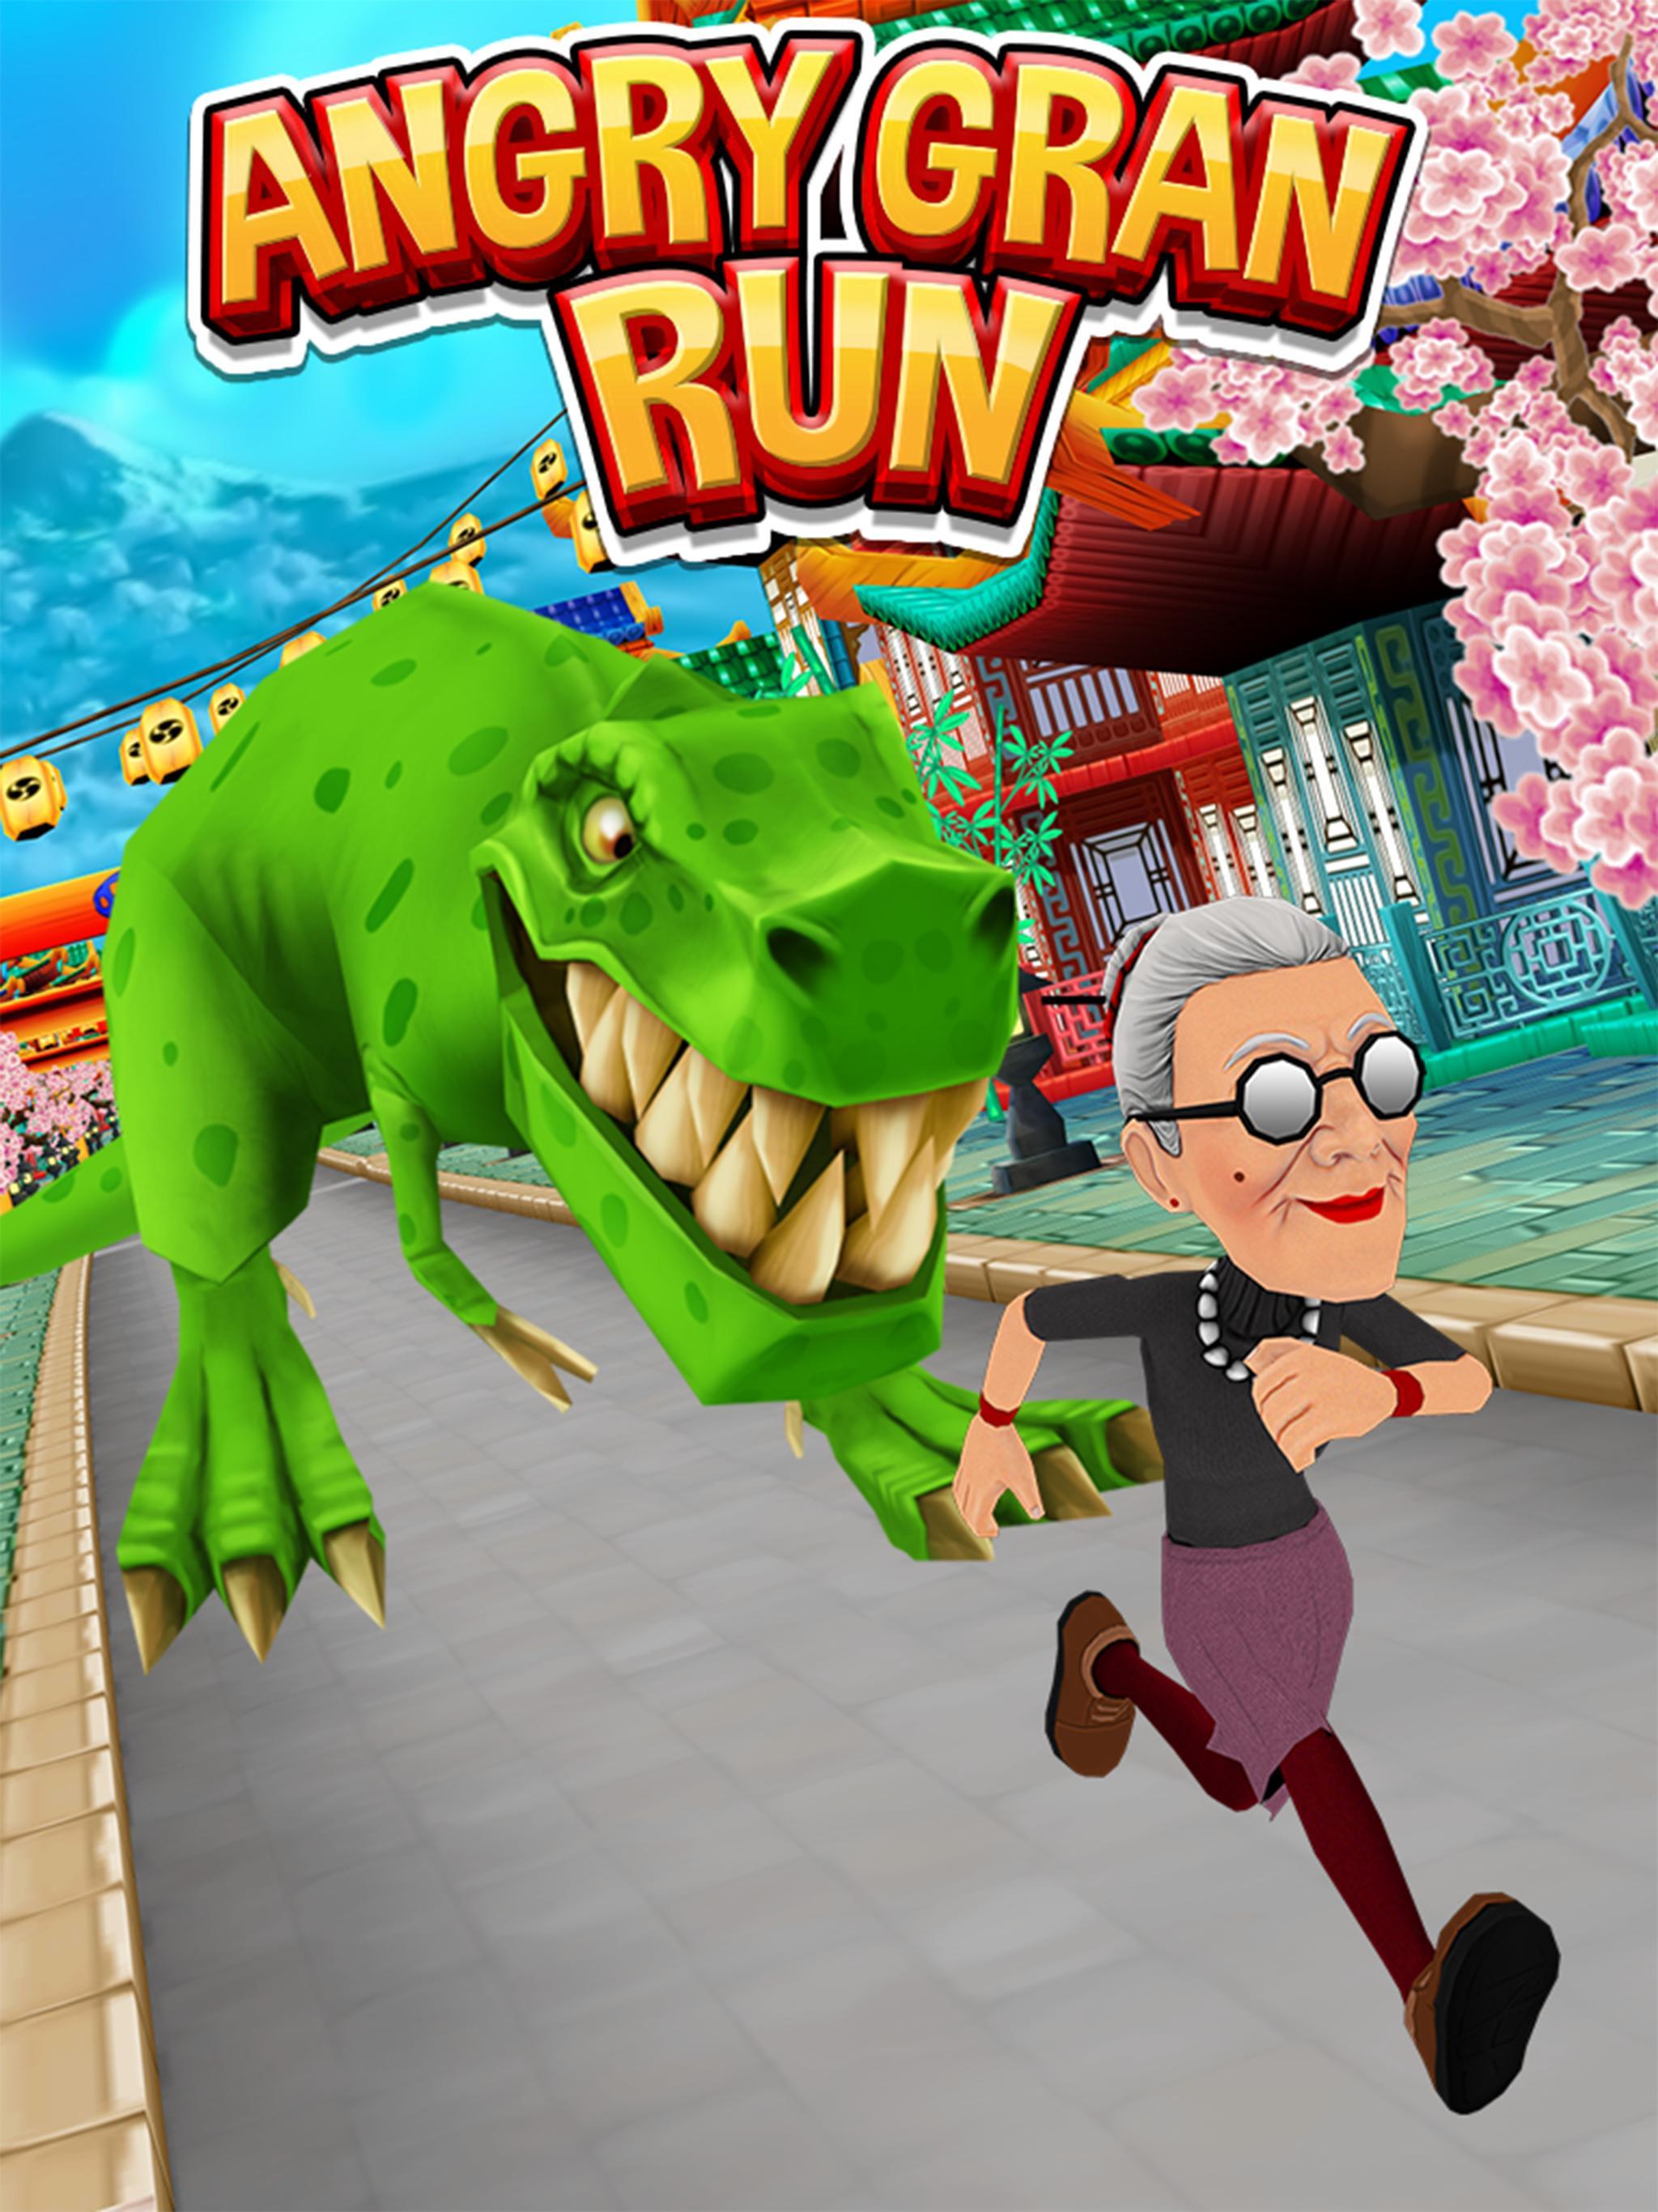 Angry Gran Run Running Game 2.12.1 Screenshot 11